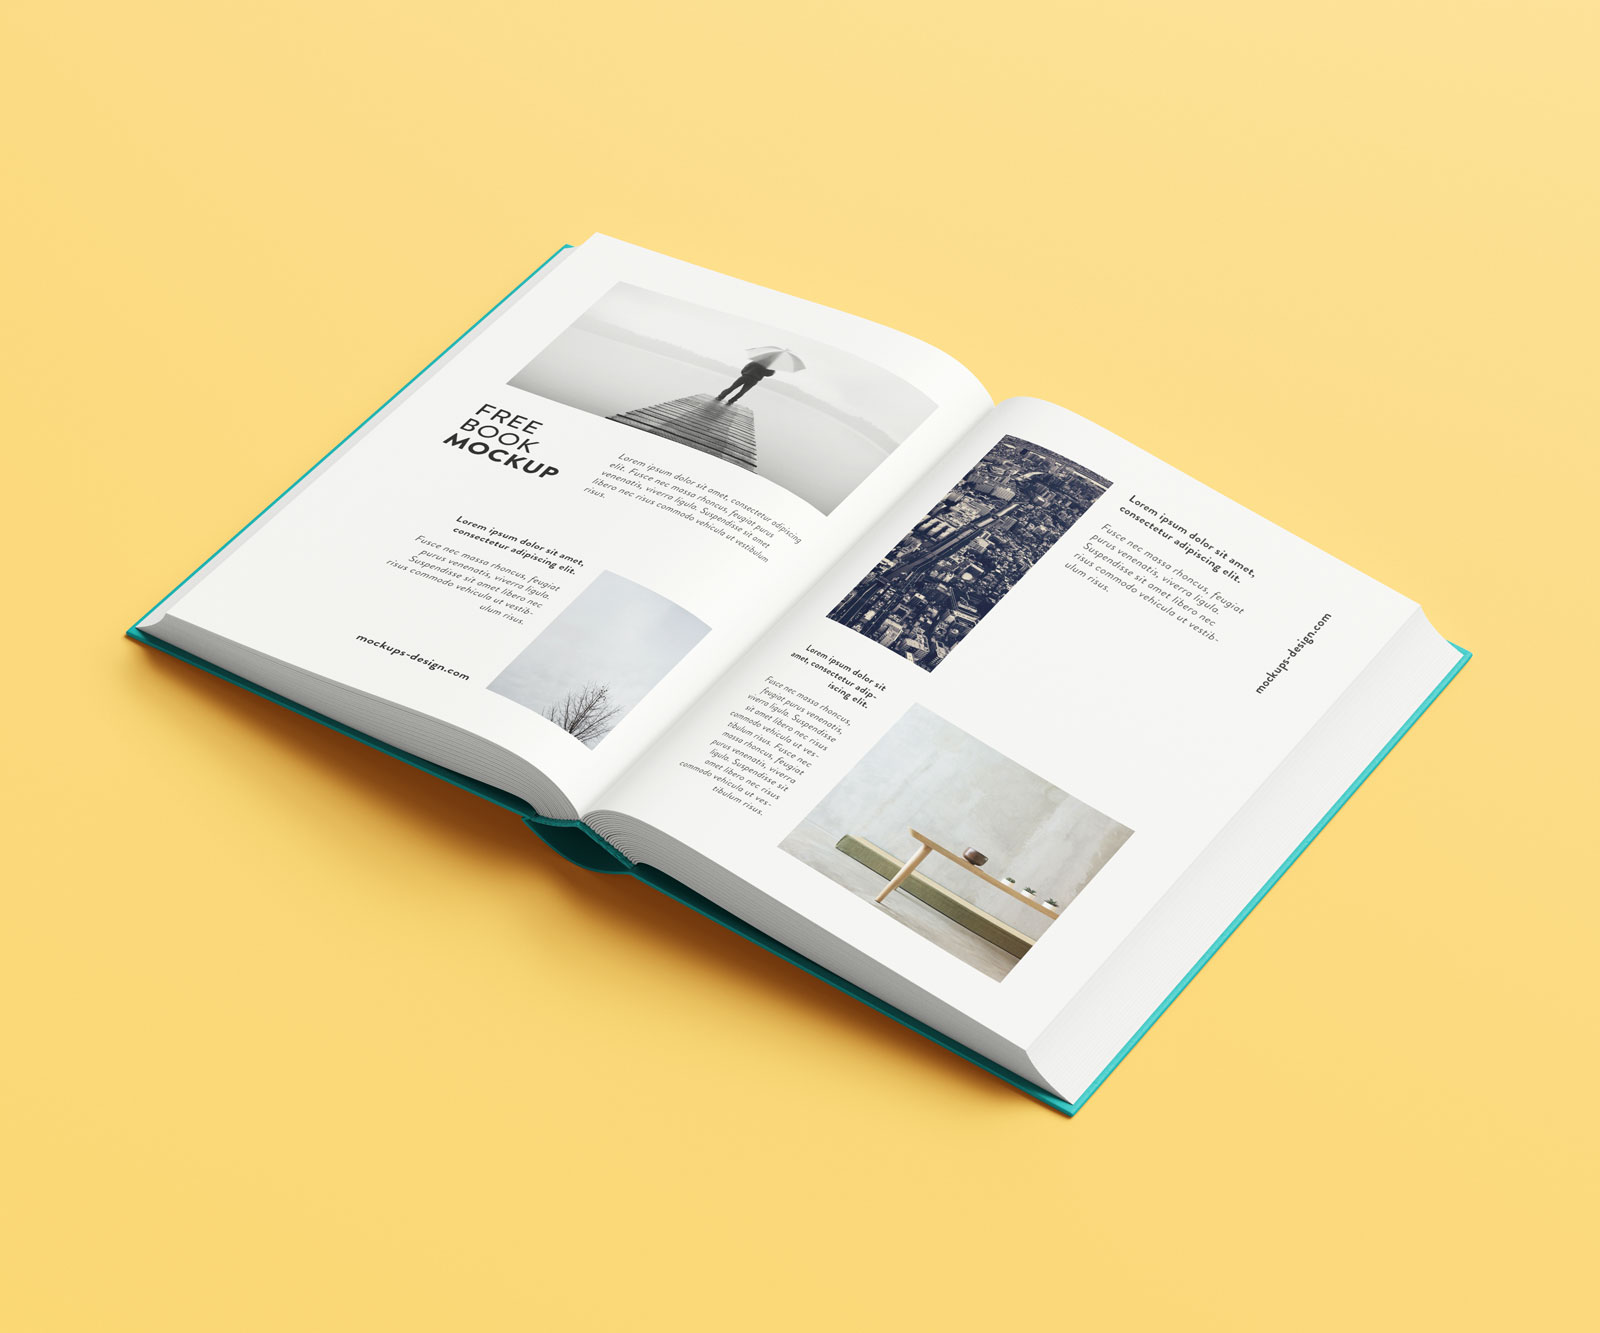 Free-Premium-Thick-Book-Mockup-PSD-6